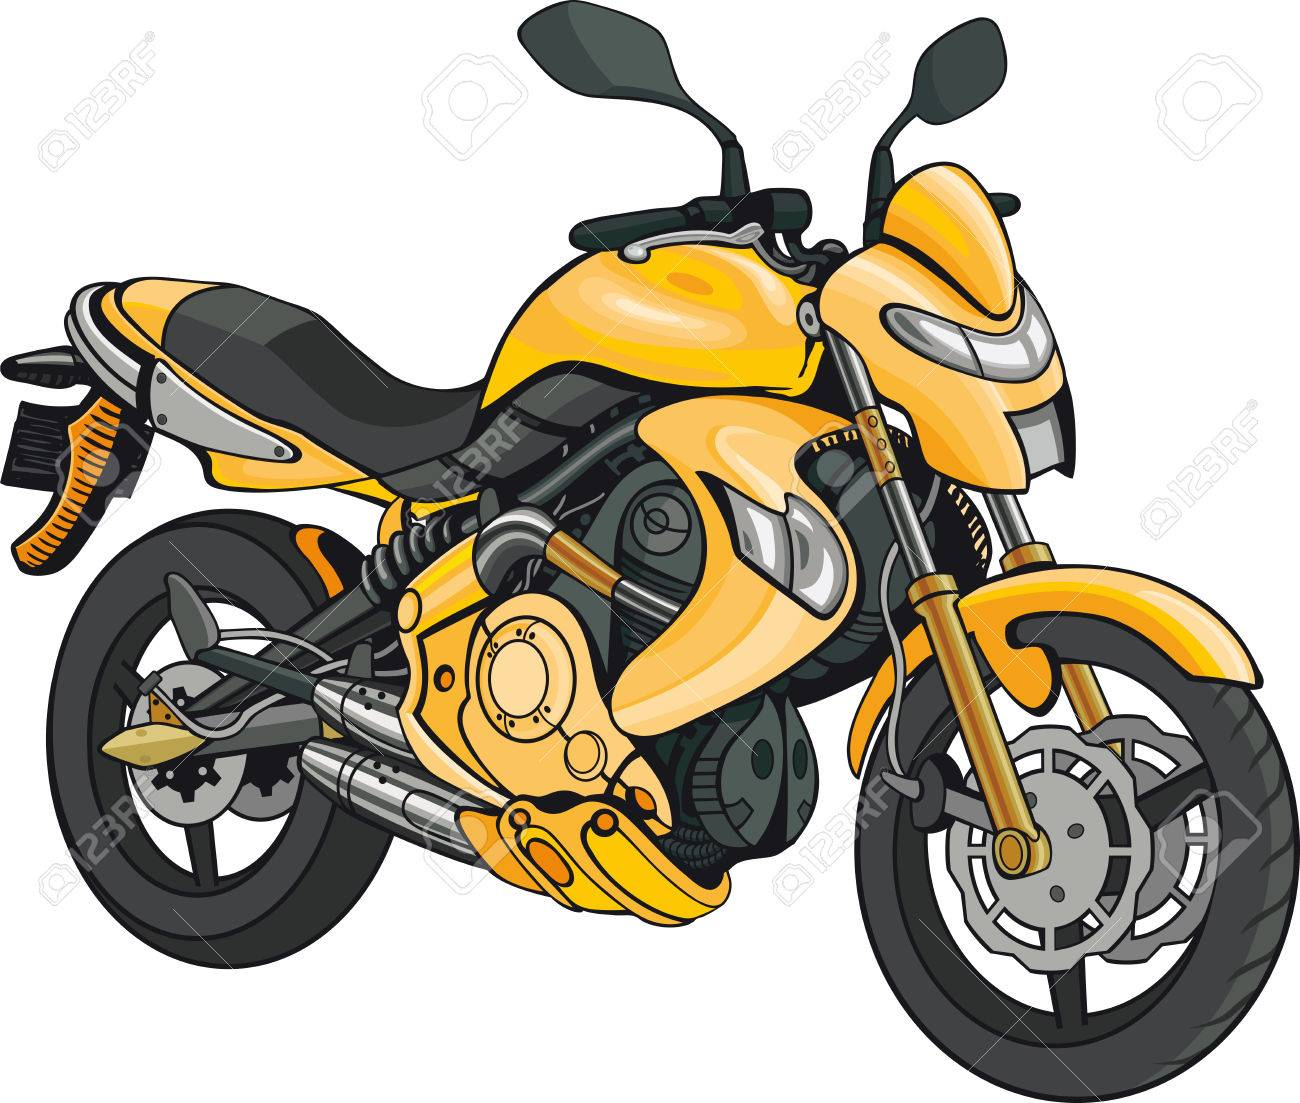 Super Motorbike Isolated Yellow Motorbike On White Background Stock Vector    44566748